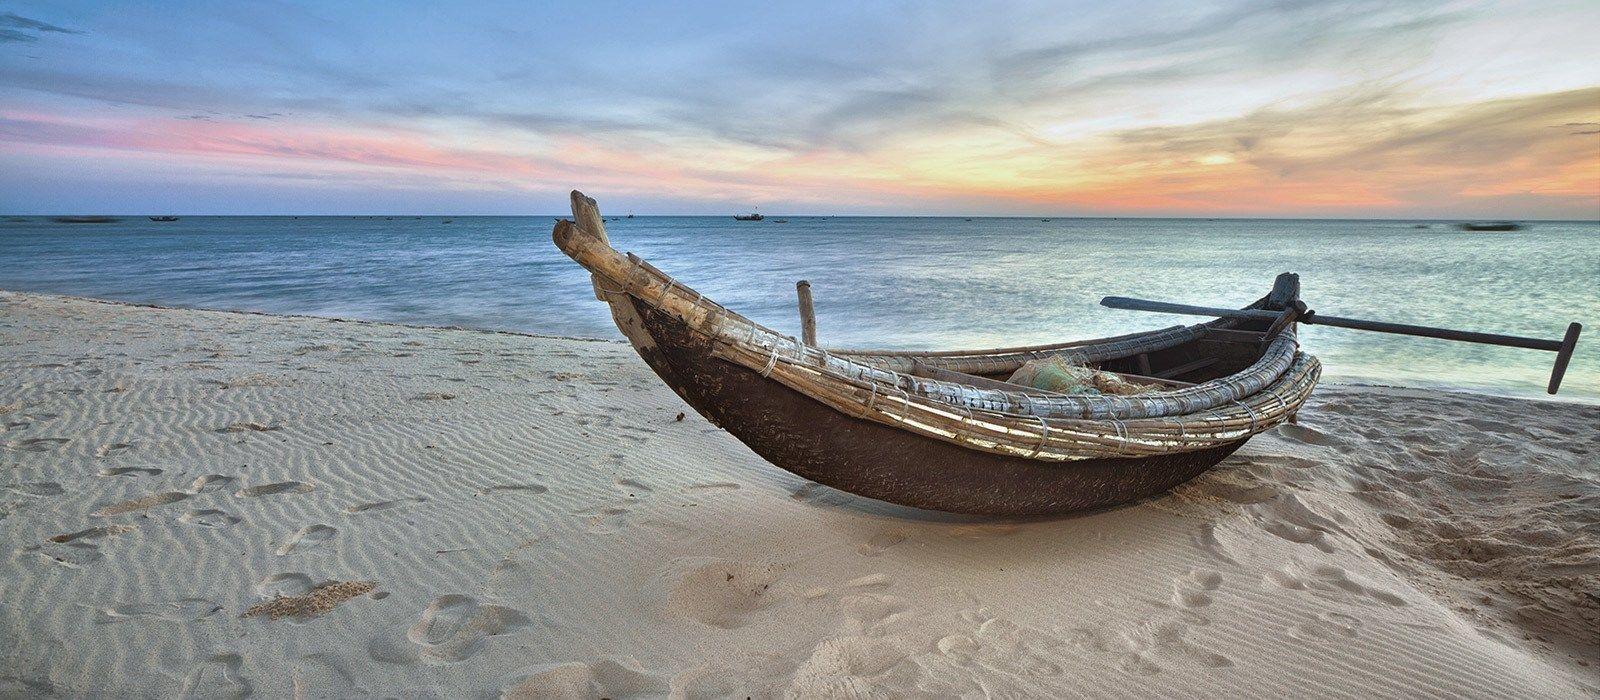 Rundreise Vietnam Kambodscha – Mekong & mehr Urlaub 4